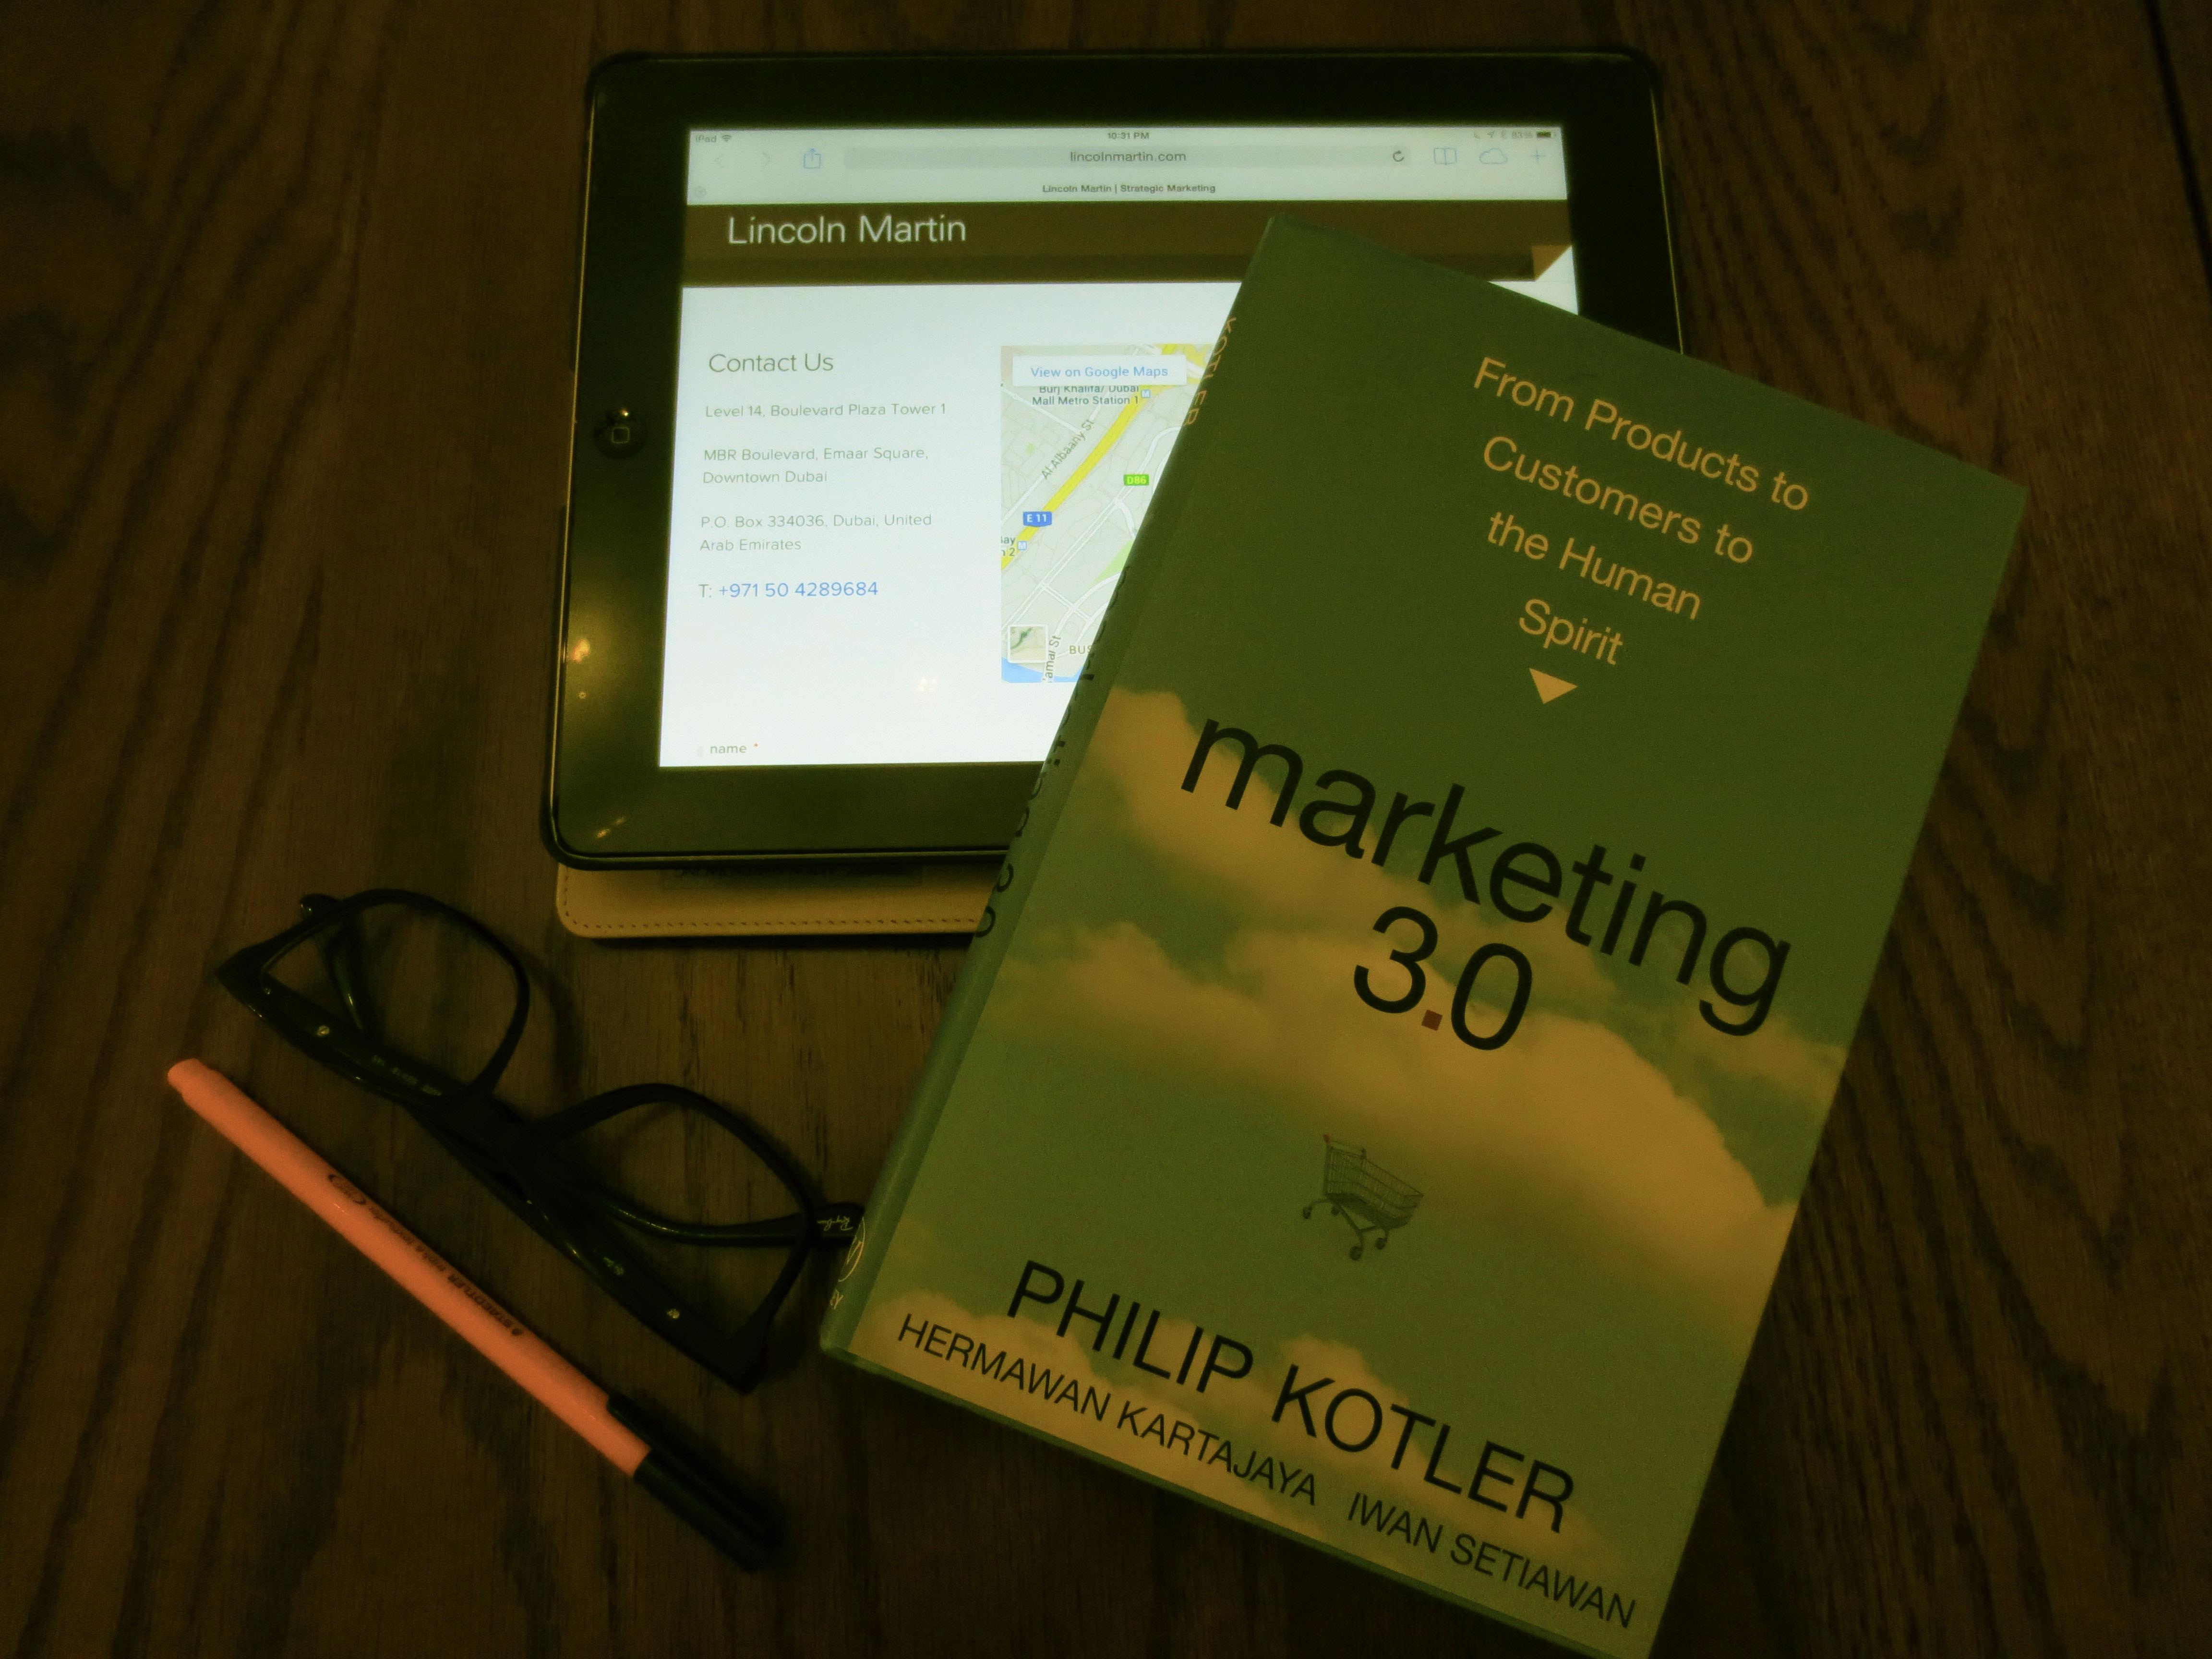 philip kotler's marketing 3.0 book review